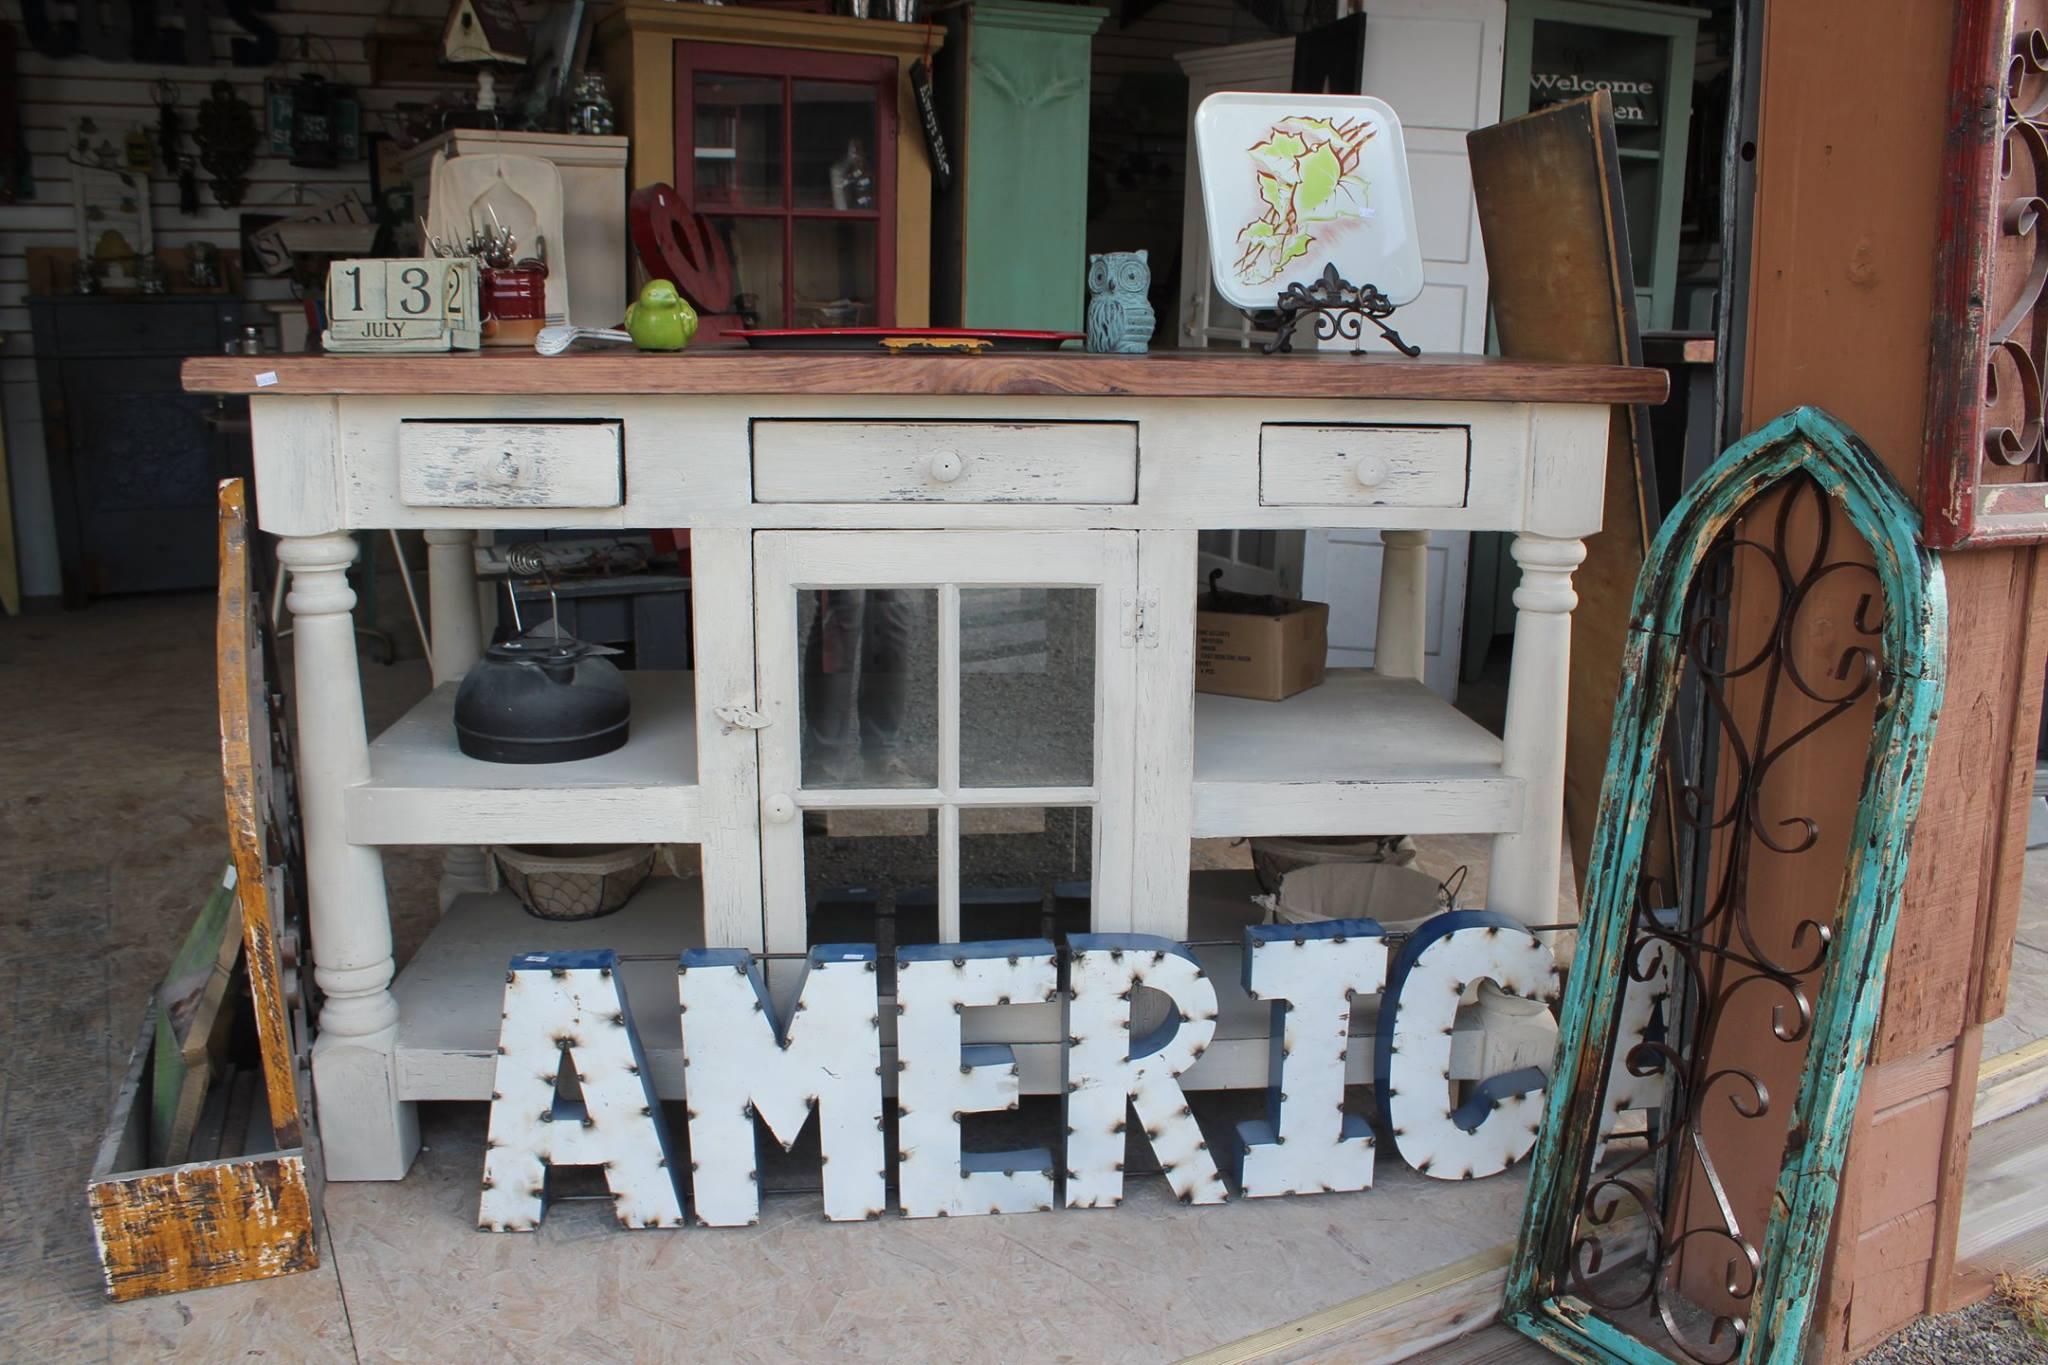 Amish Furniture At Shipshewana Flea Market Little Red Hen House